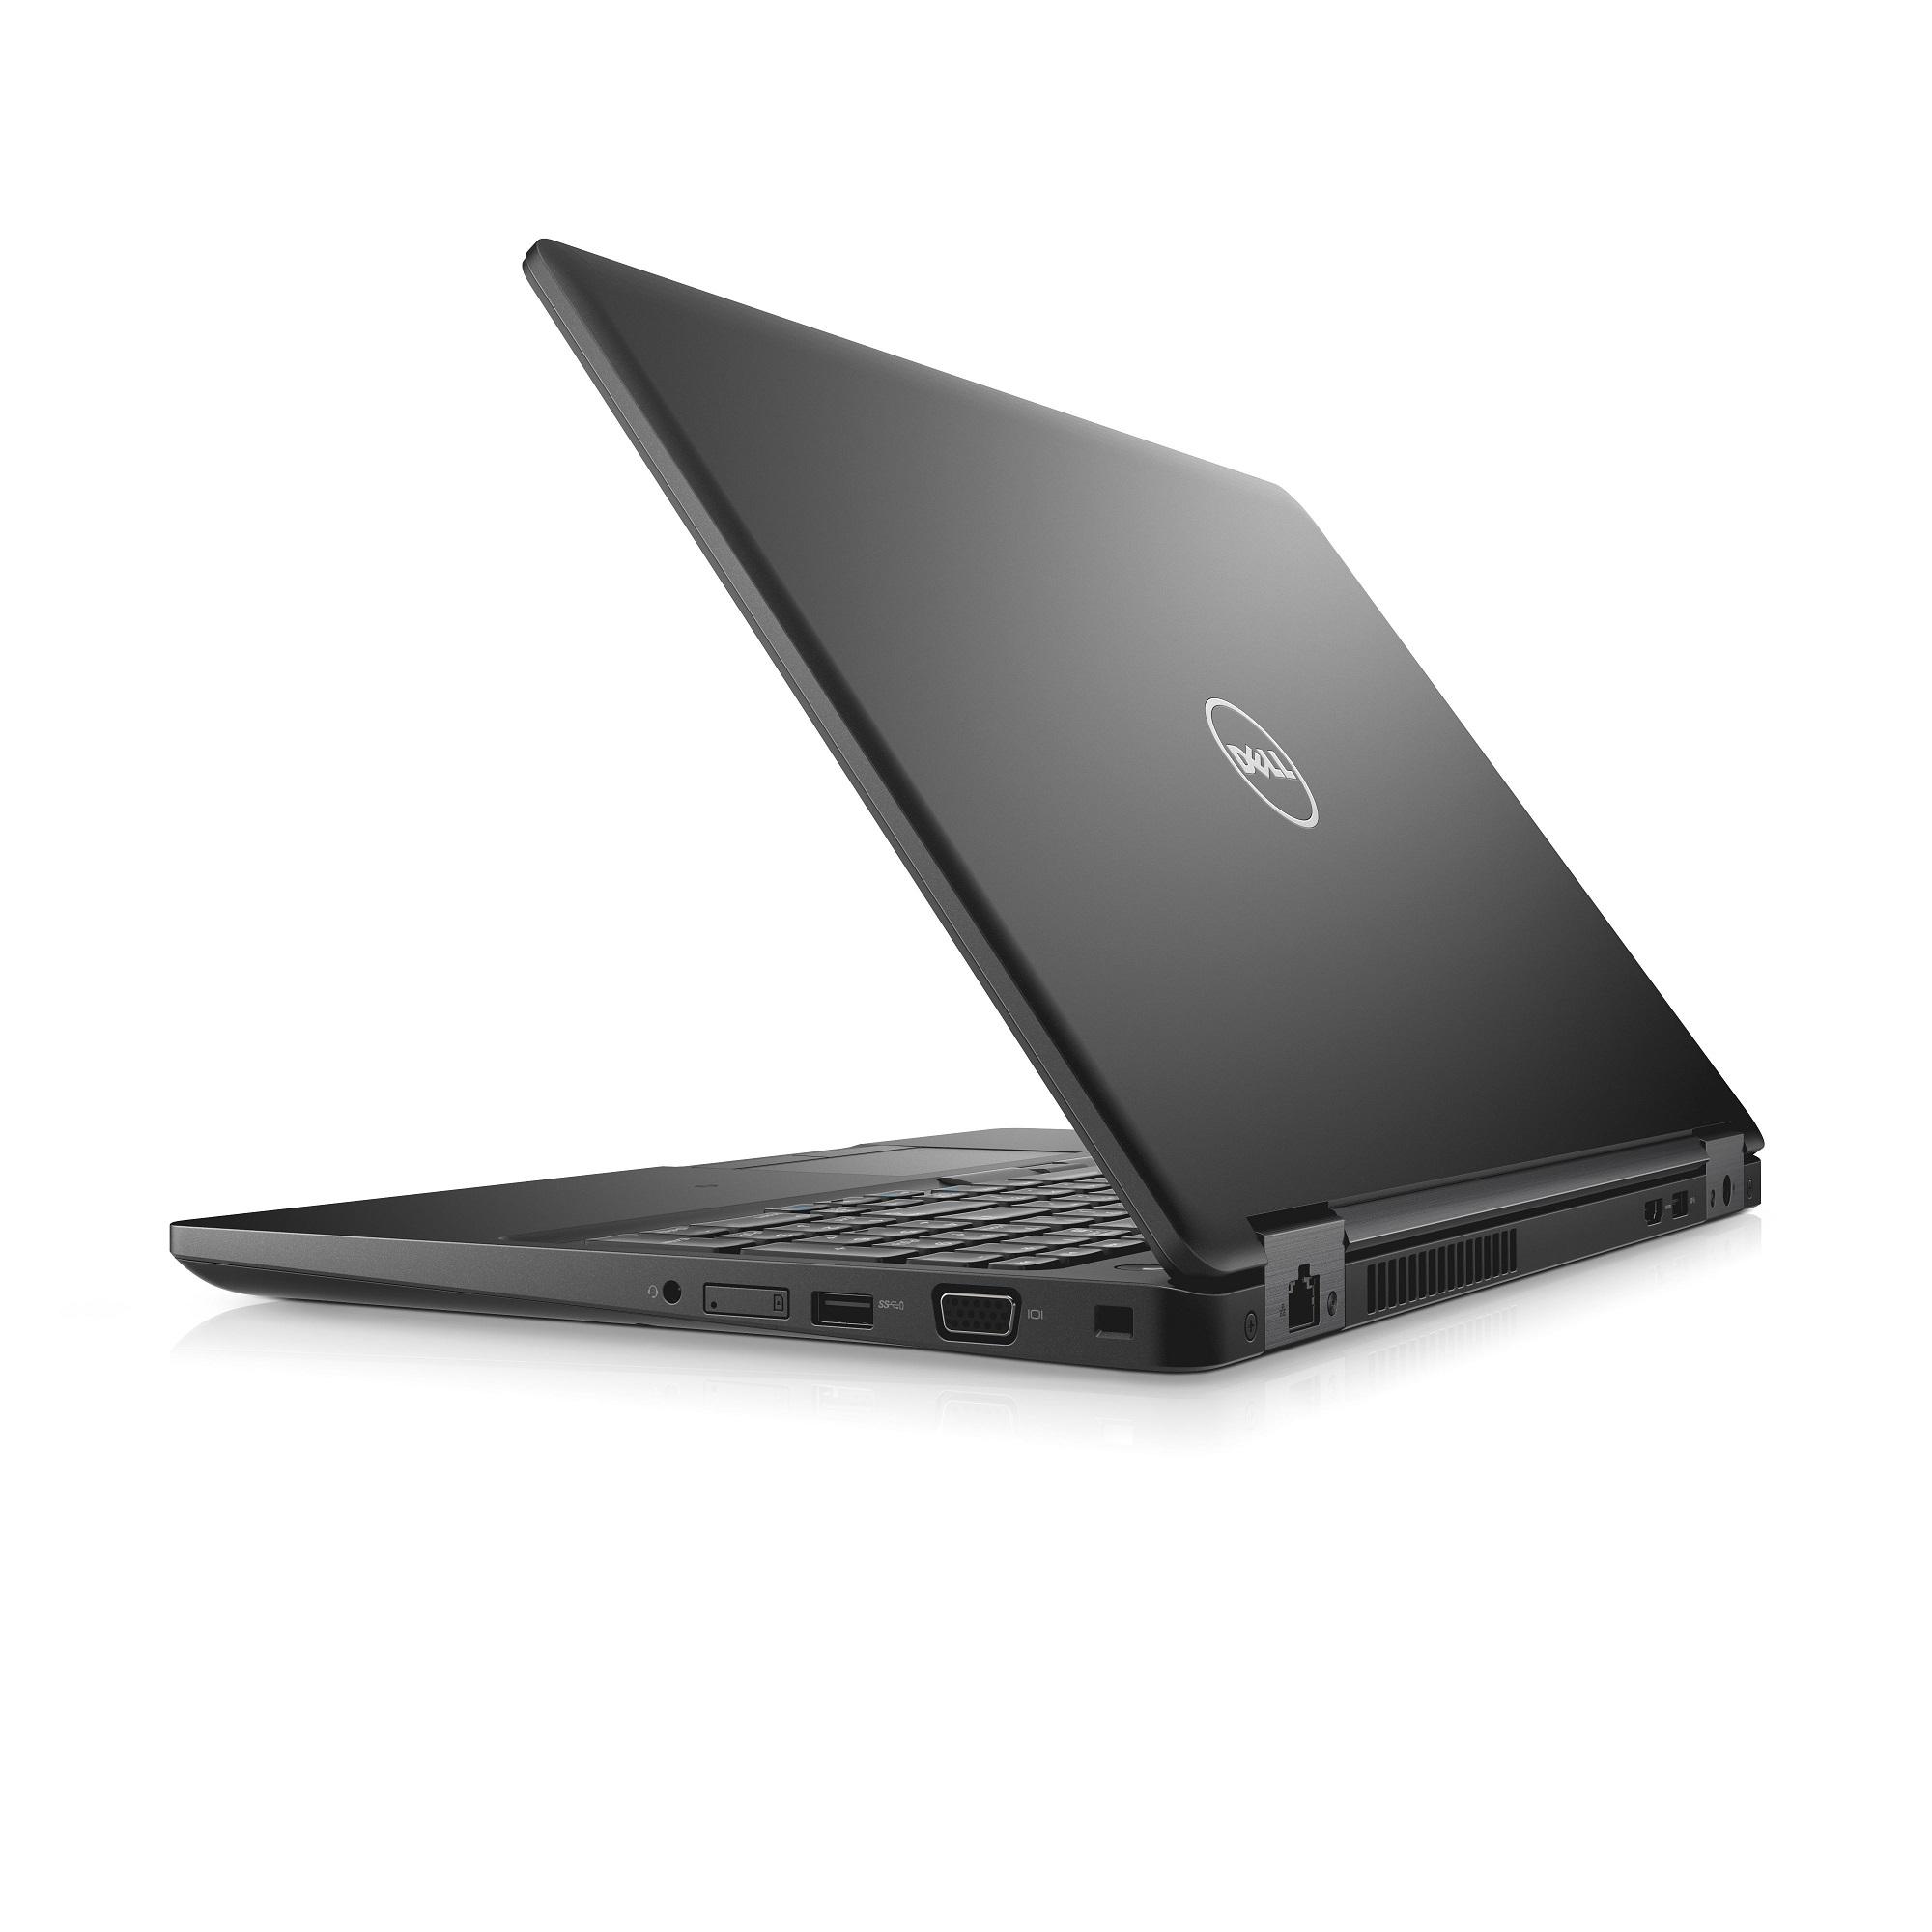 "Dell Latitude 5580 15"" FHD i5-7440HQ/8GB/500GB/MCR/HDMI/VGA/USB-C/W10P/3RNBD/Černý"